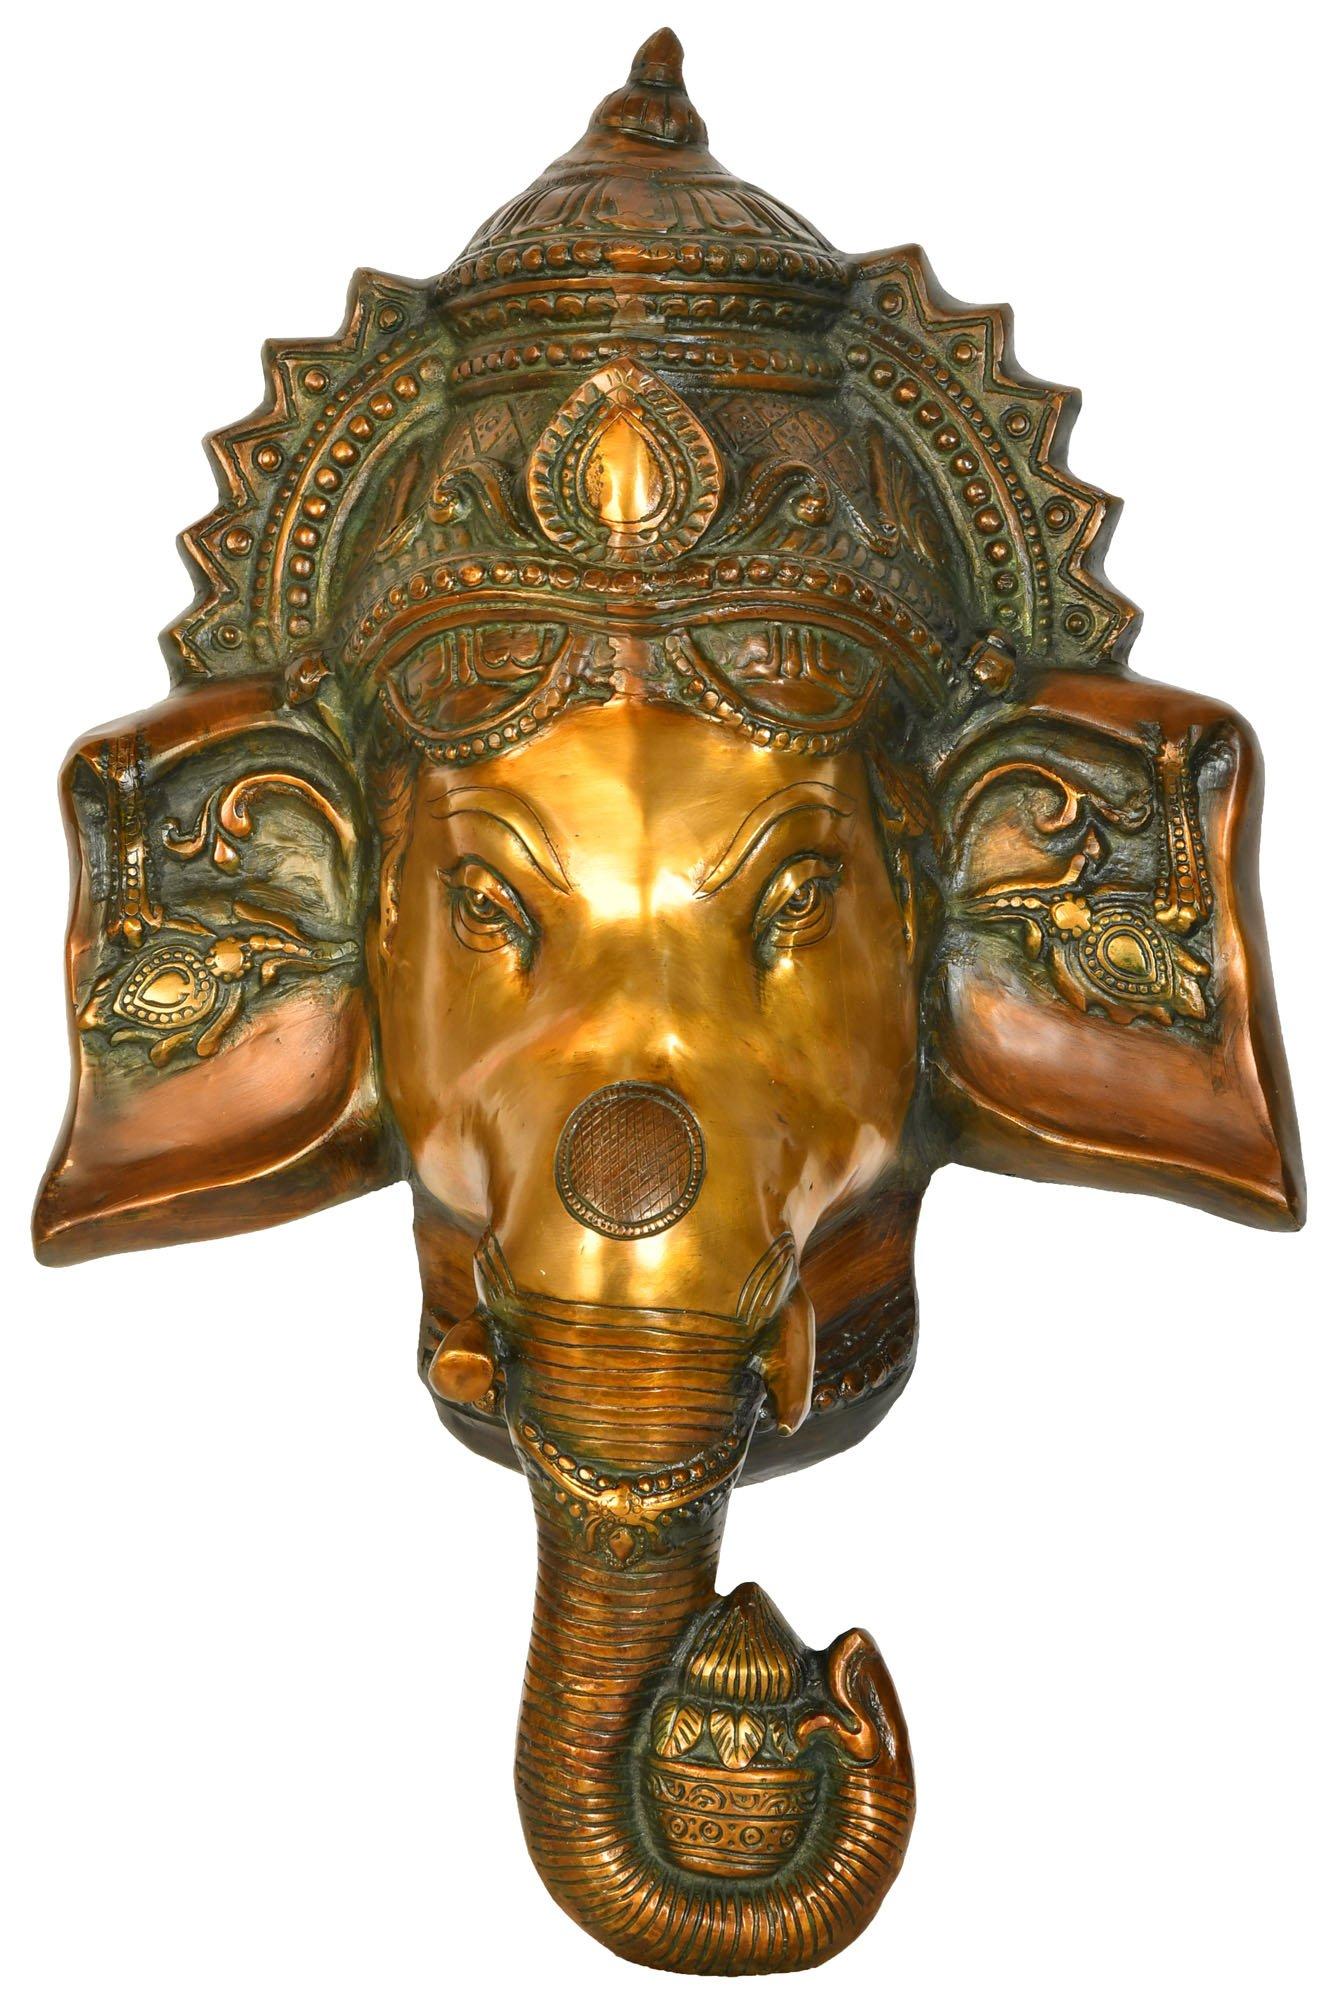 Auspicious Lord Ganesha Wall Hanging Mask (Large Size) - Brass Statue